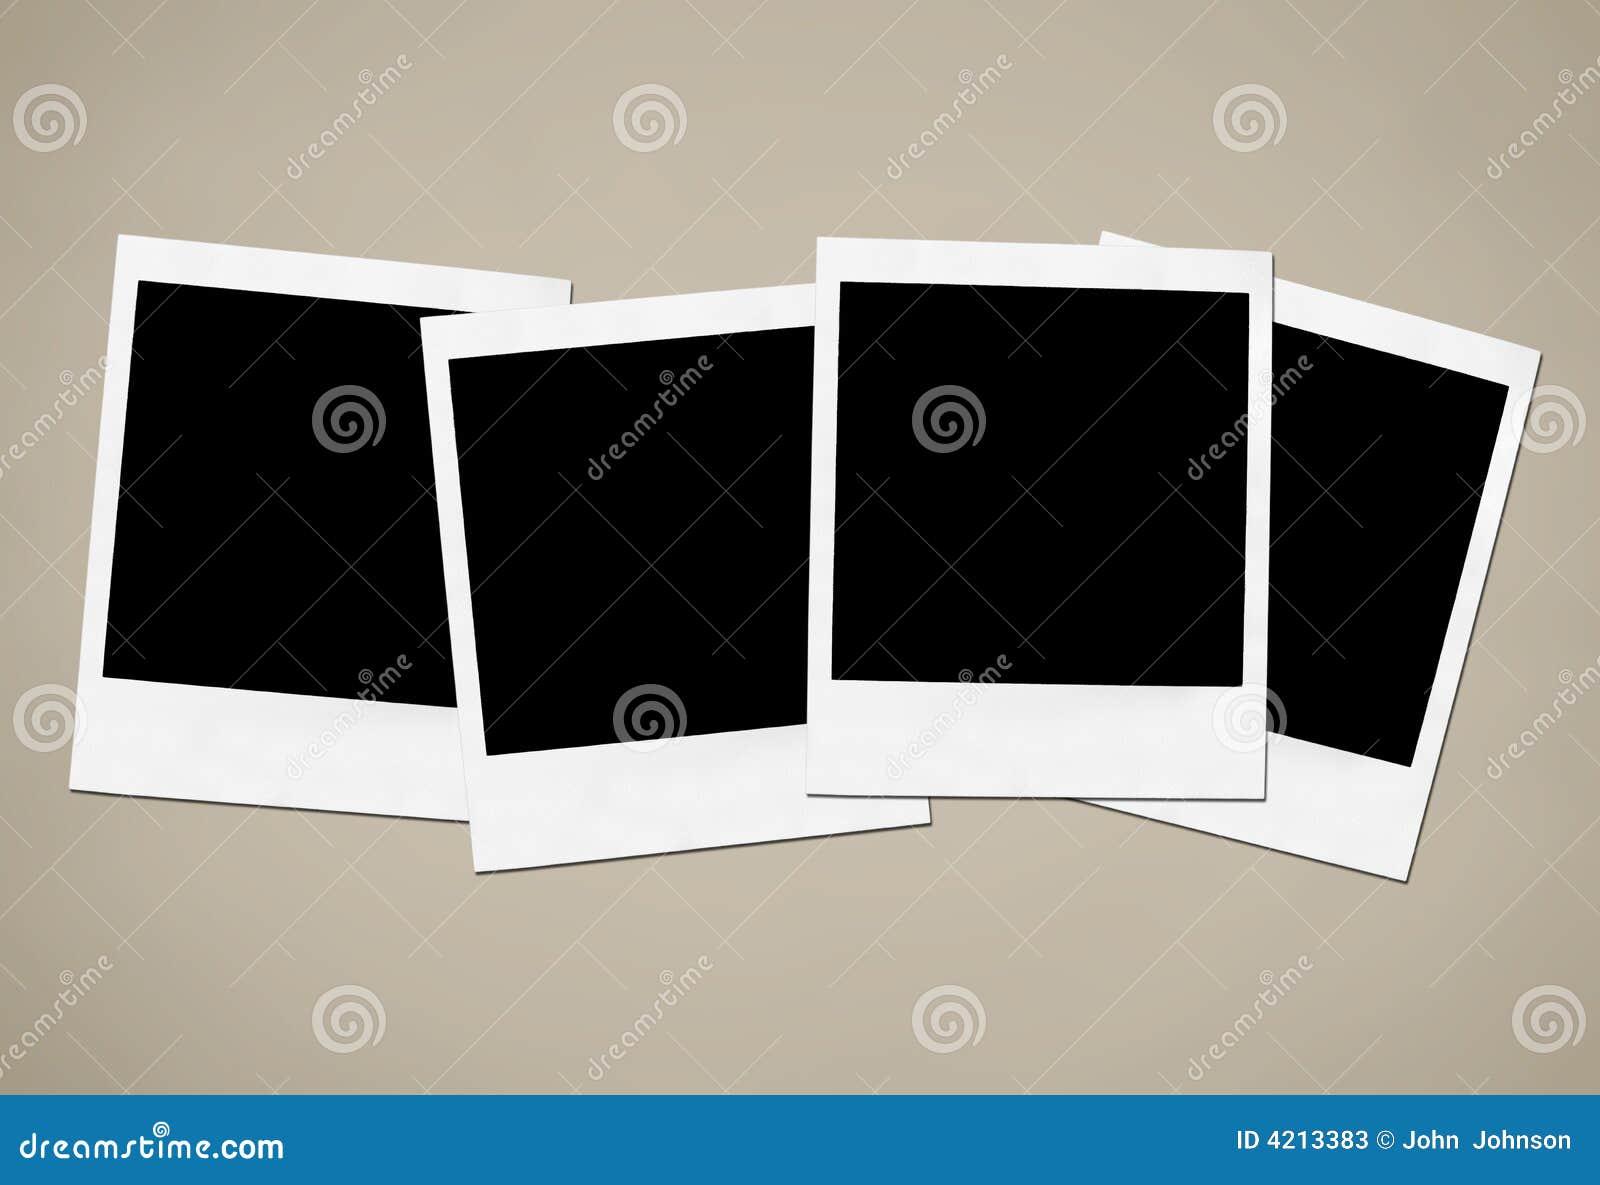 Instant Camera Frames Stock Image Image Of Fine Large